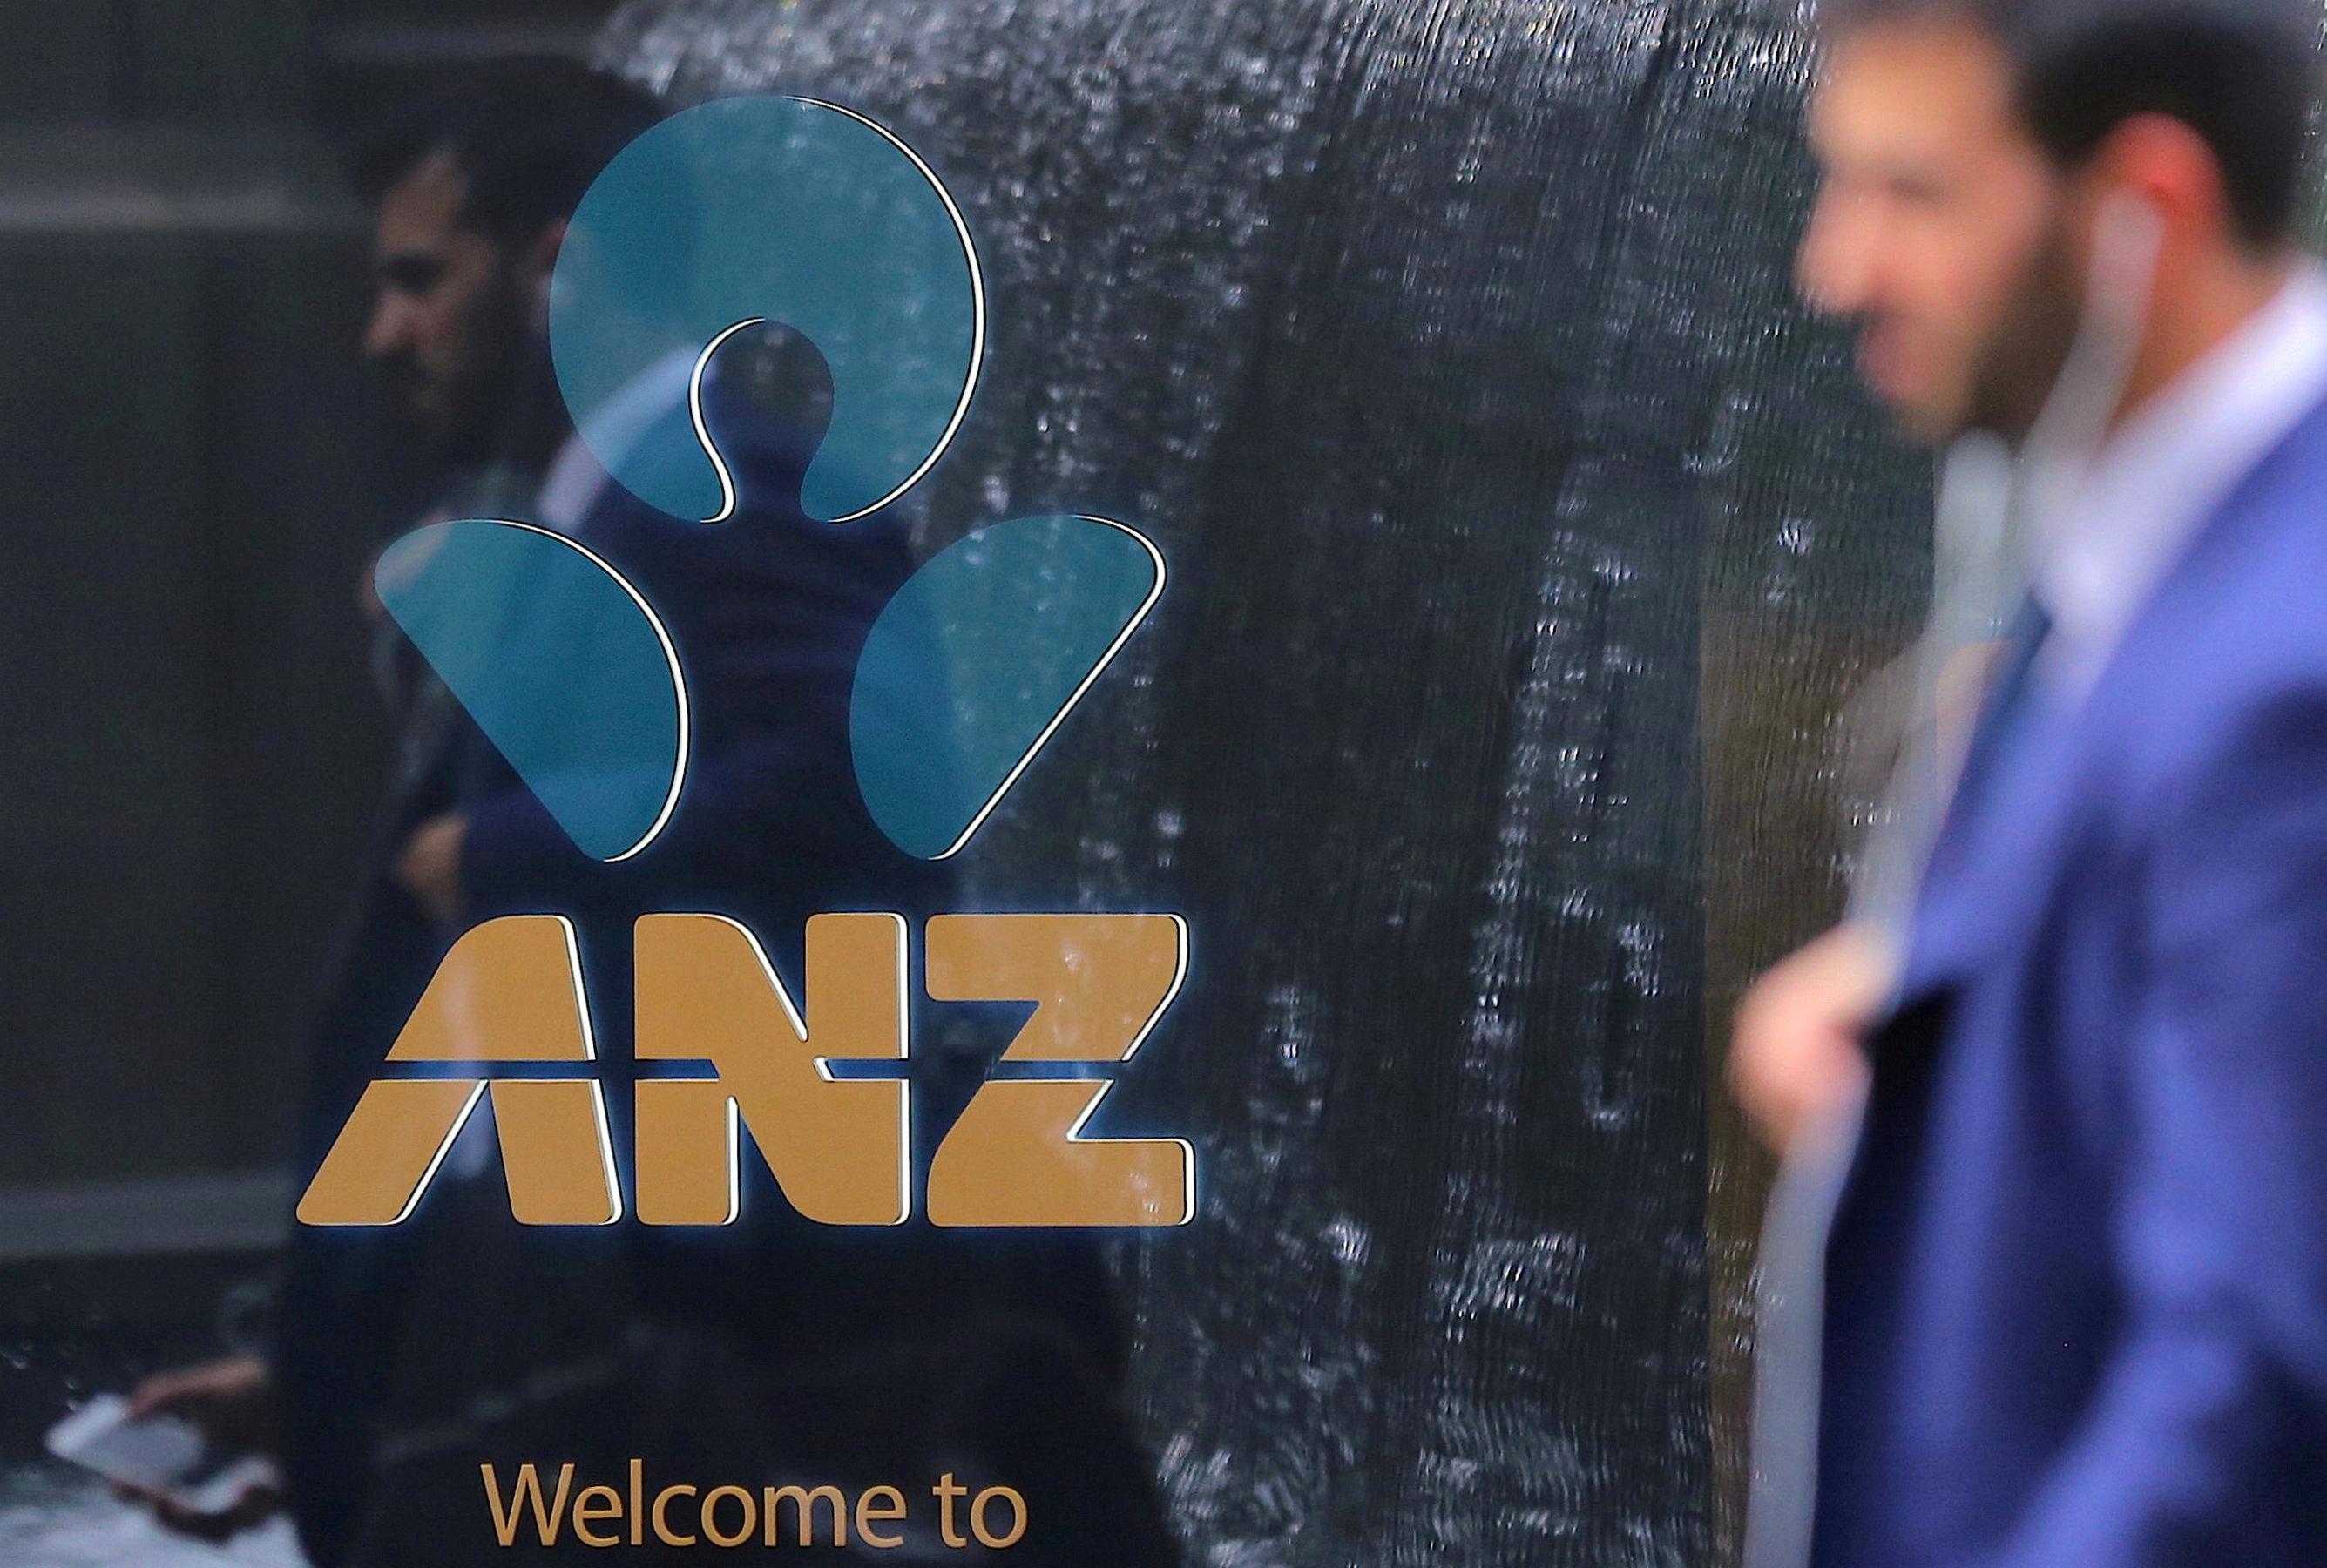 Australia's ANZ fired senior executives due to bad banking behavior